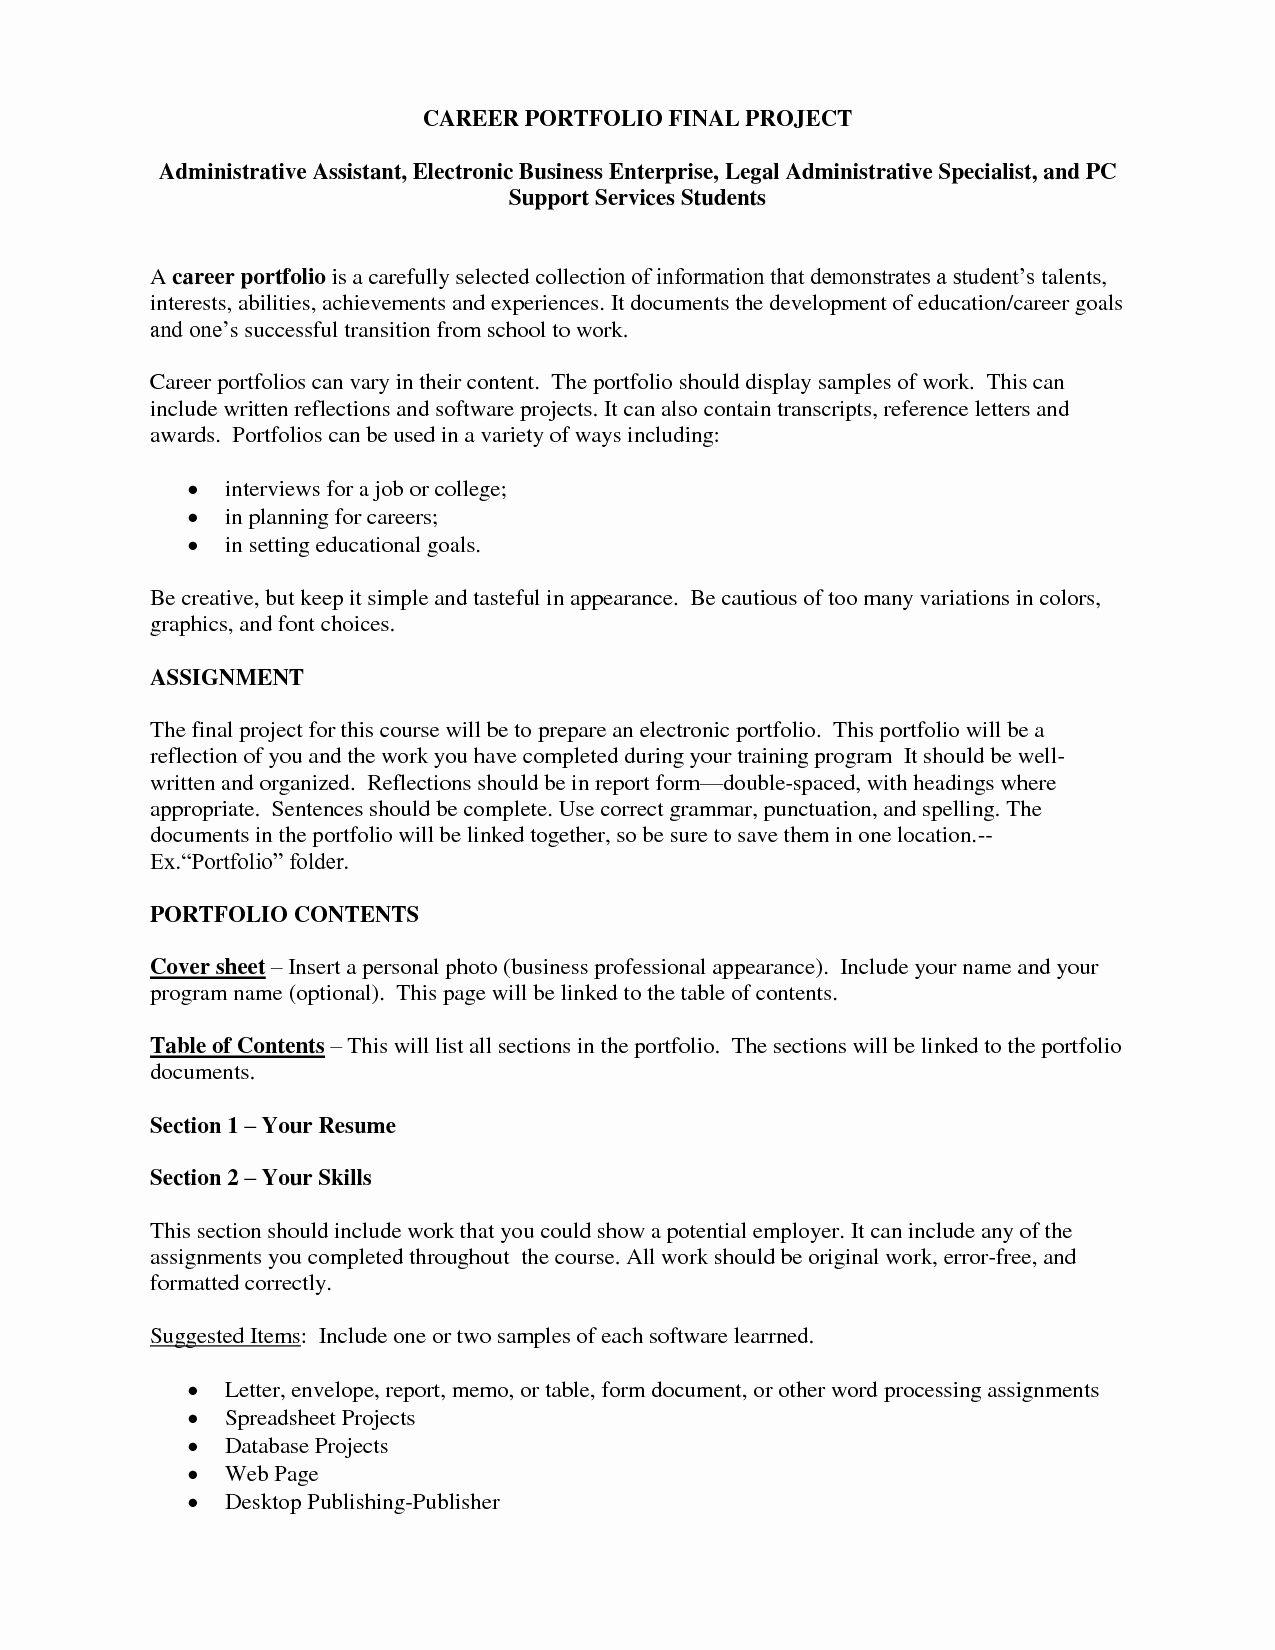 Buy essay club review quizlet